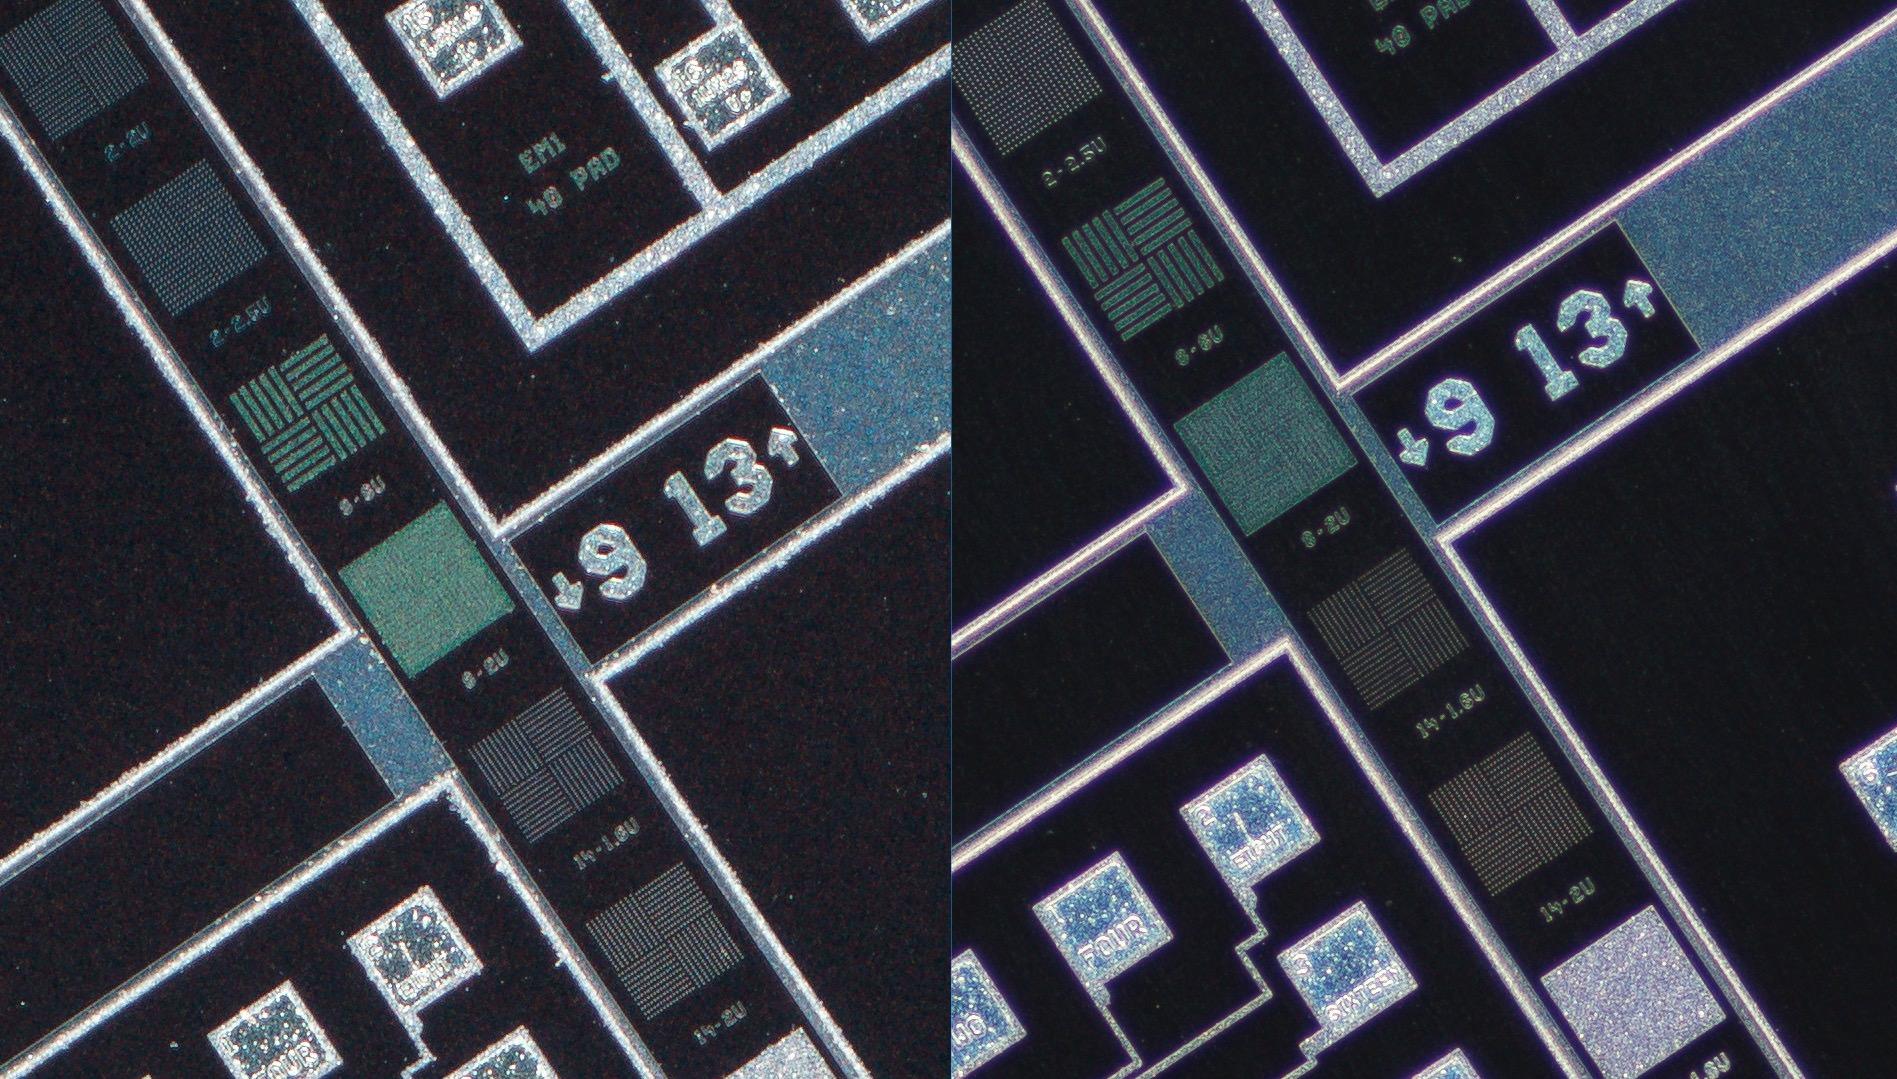 Lomo 3.7x 0.11   Microscope Objective vs Nikon CFI Plan Fluor 4X/0.13 Microscope Objective vs 100% center crop.Clicking on an image will open a larger version.